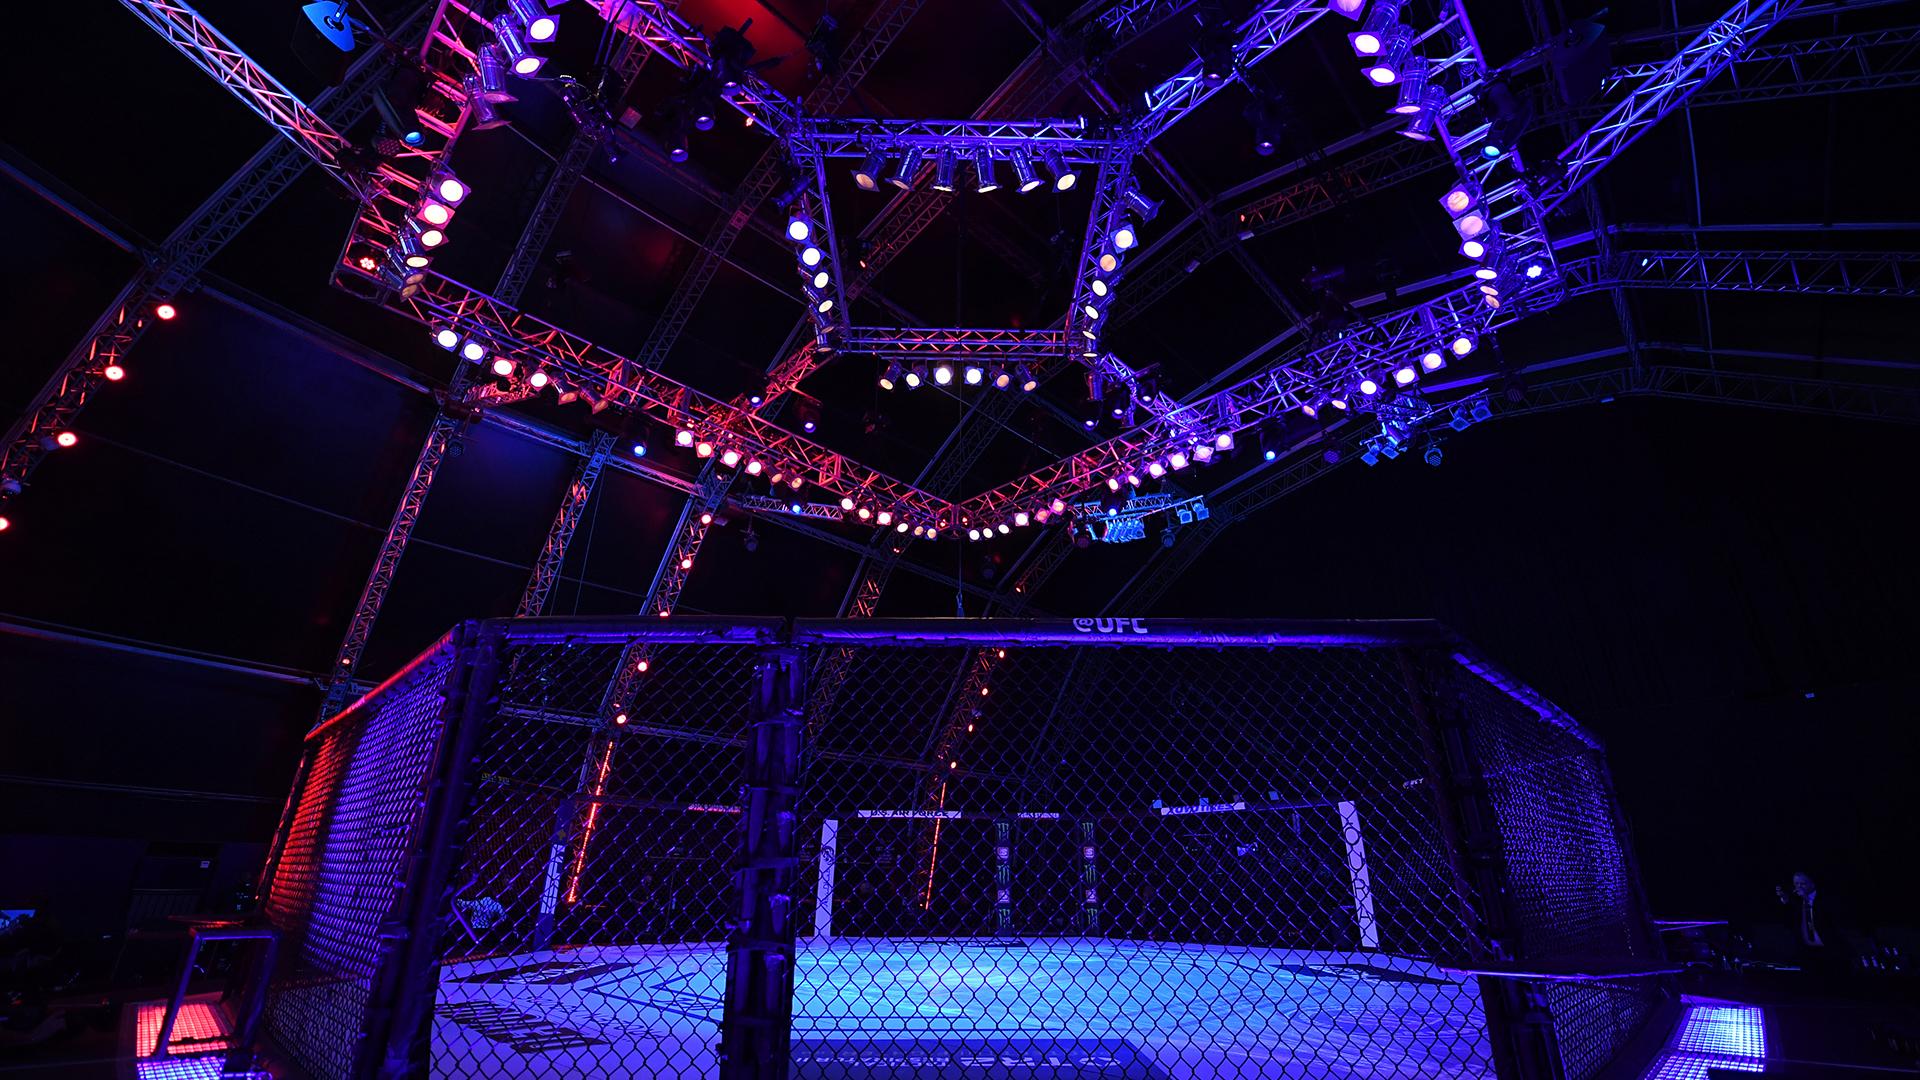 Confira todos os resultados do UFC 254